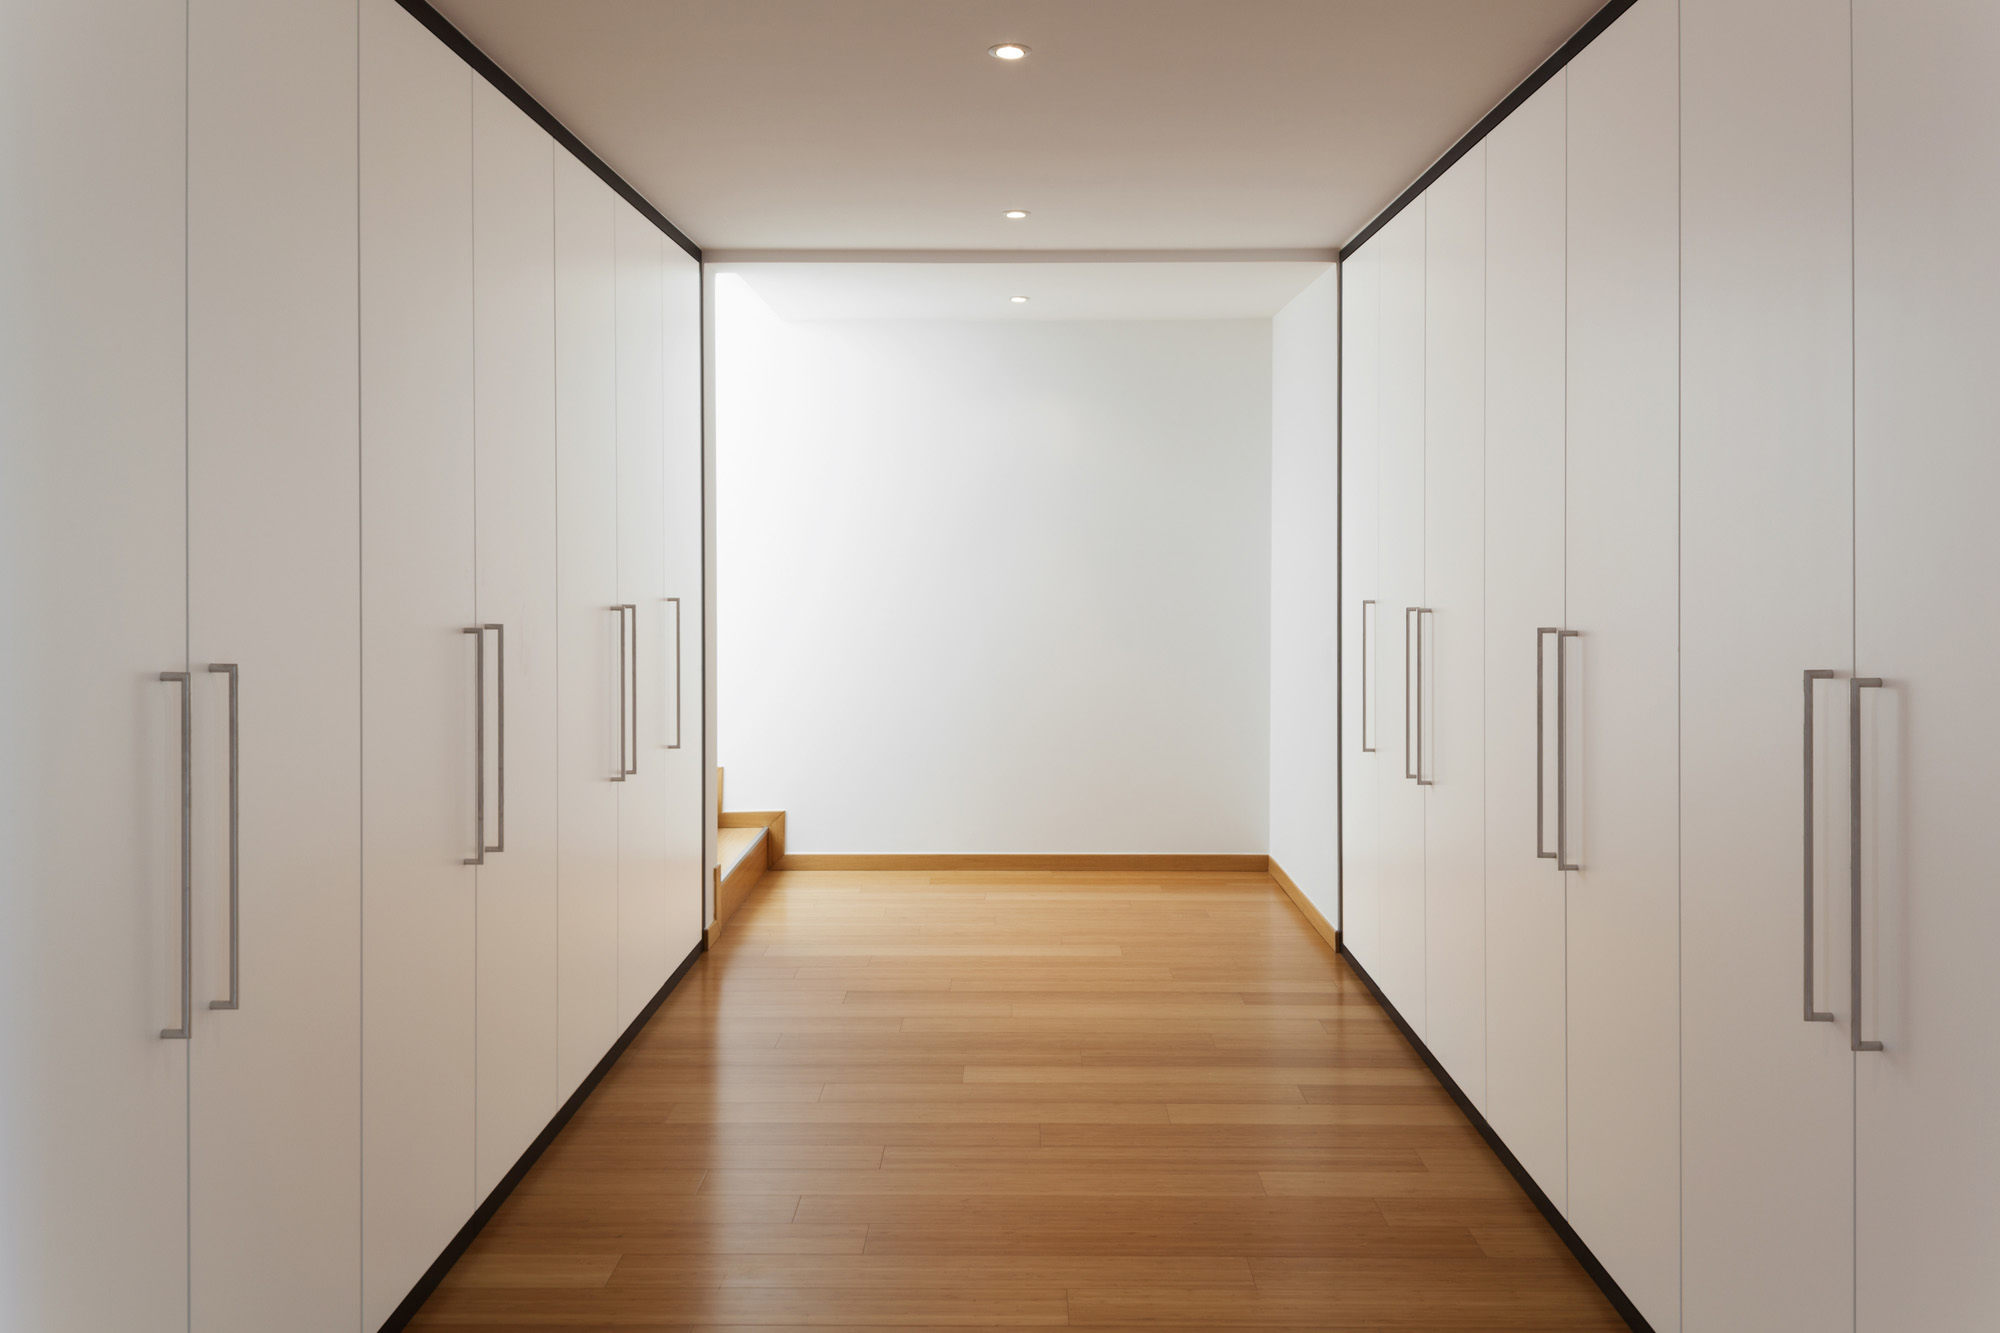 fitted wardrobes, dressing room, white wardrobe, hinged wardrobe doors